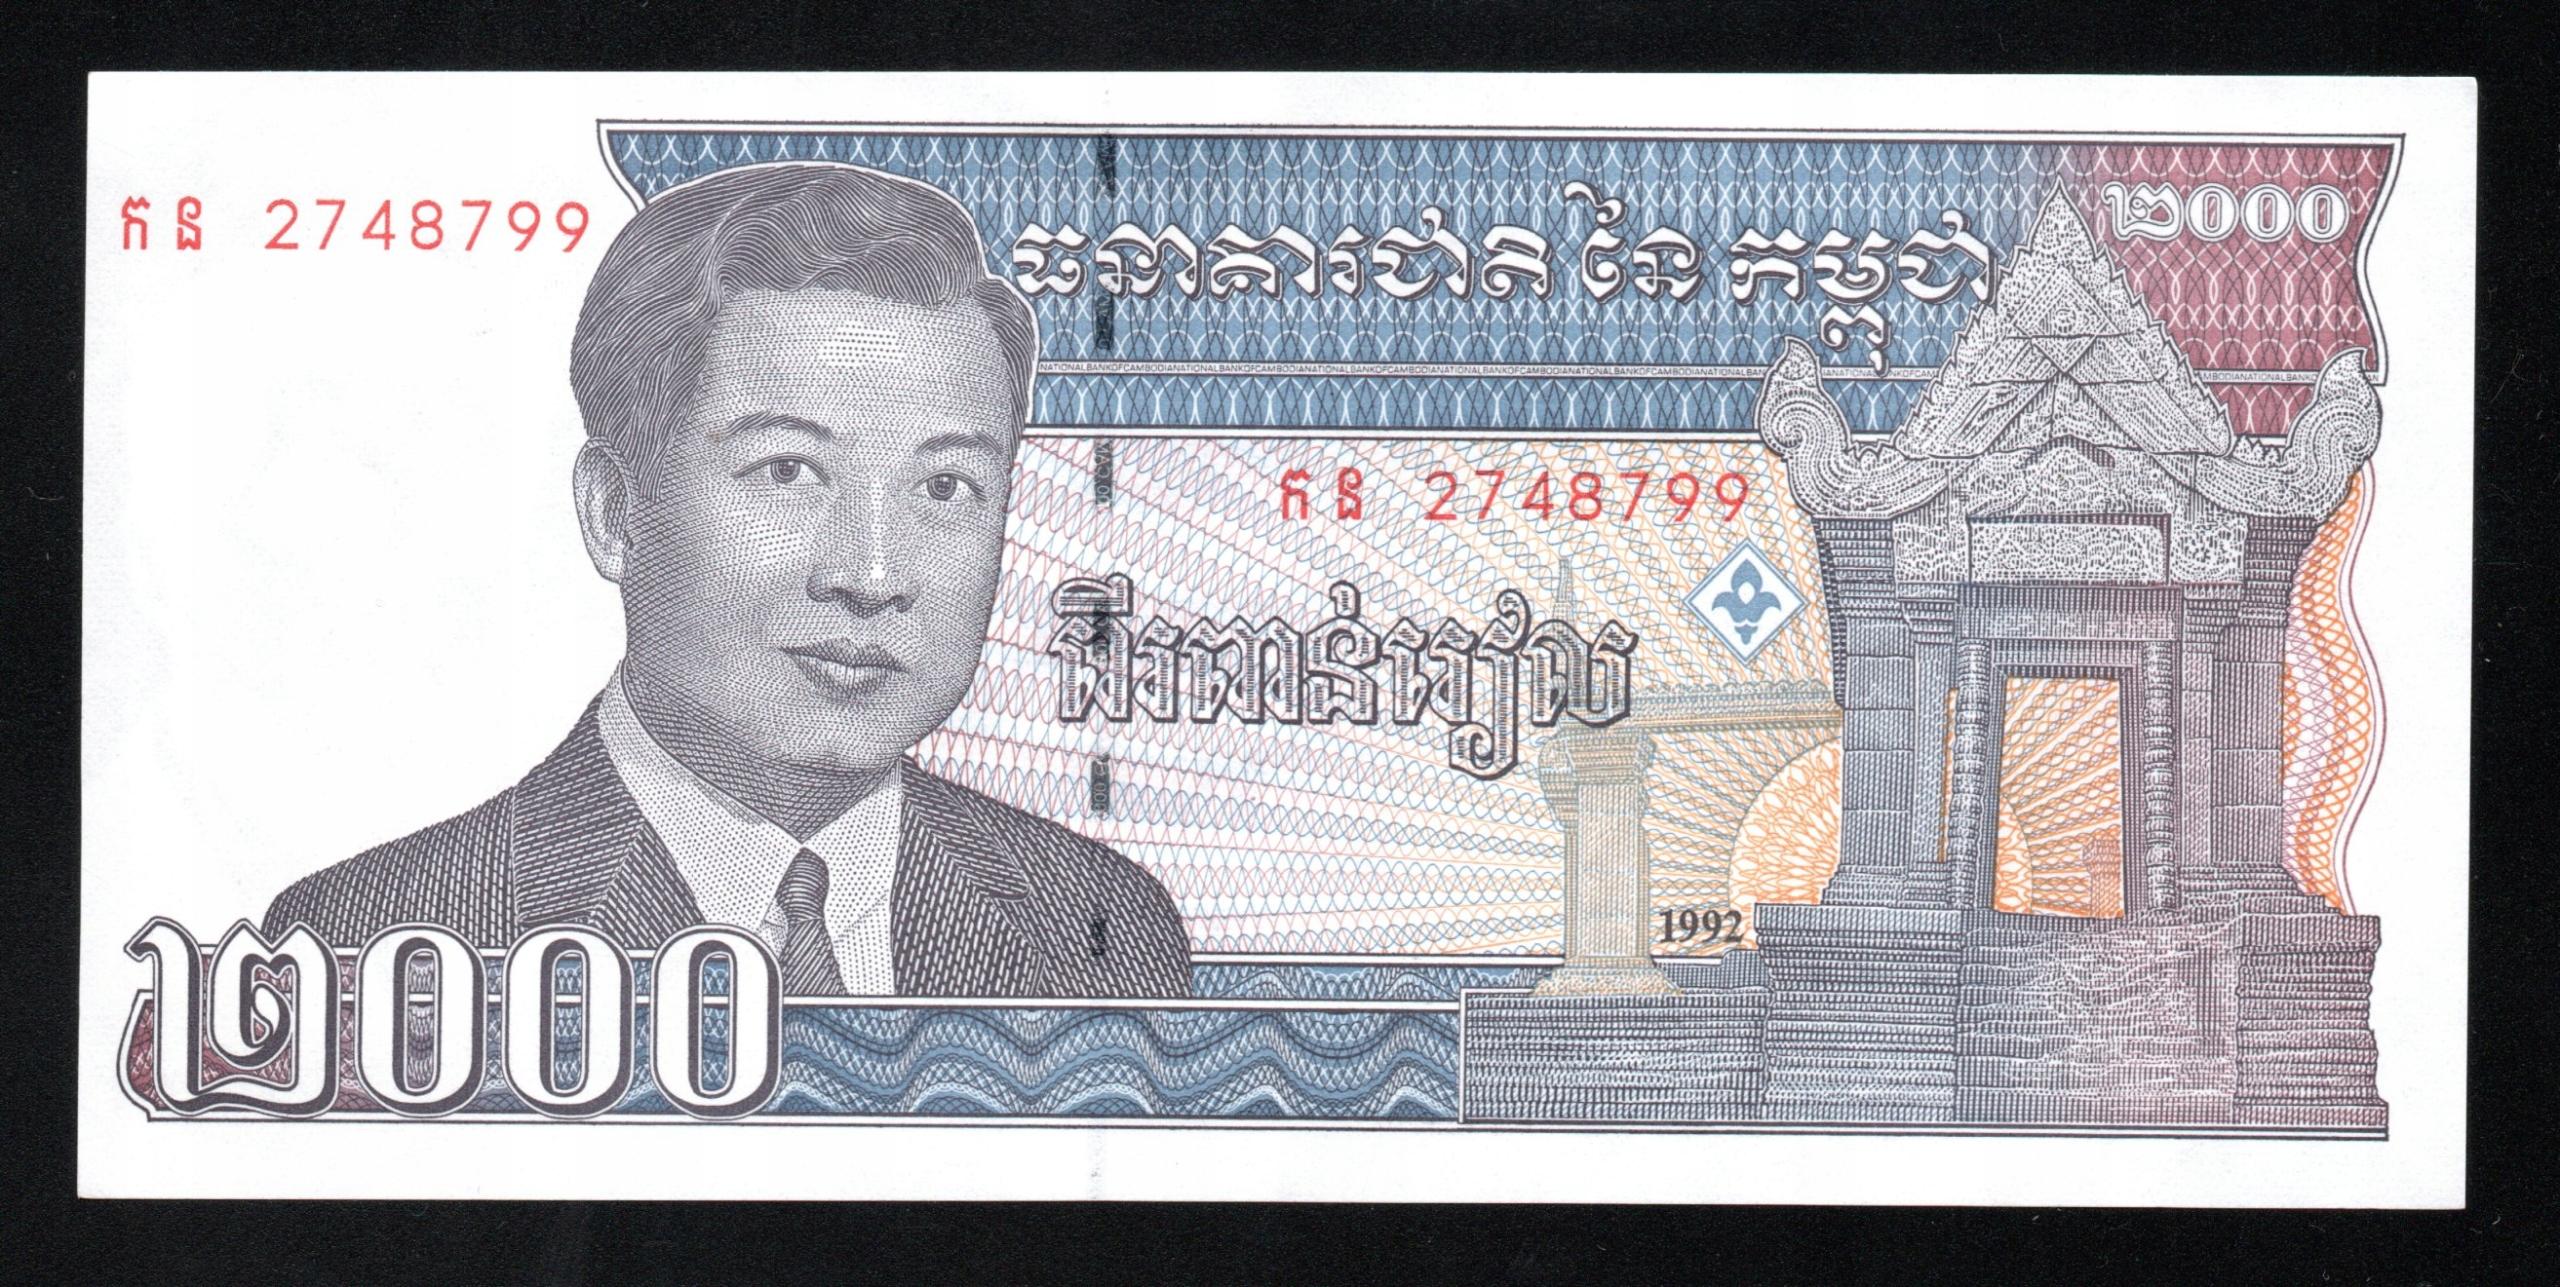 Камбоджа 2000 RIELS P-40 UNC 1992